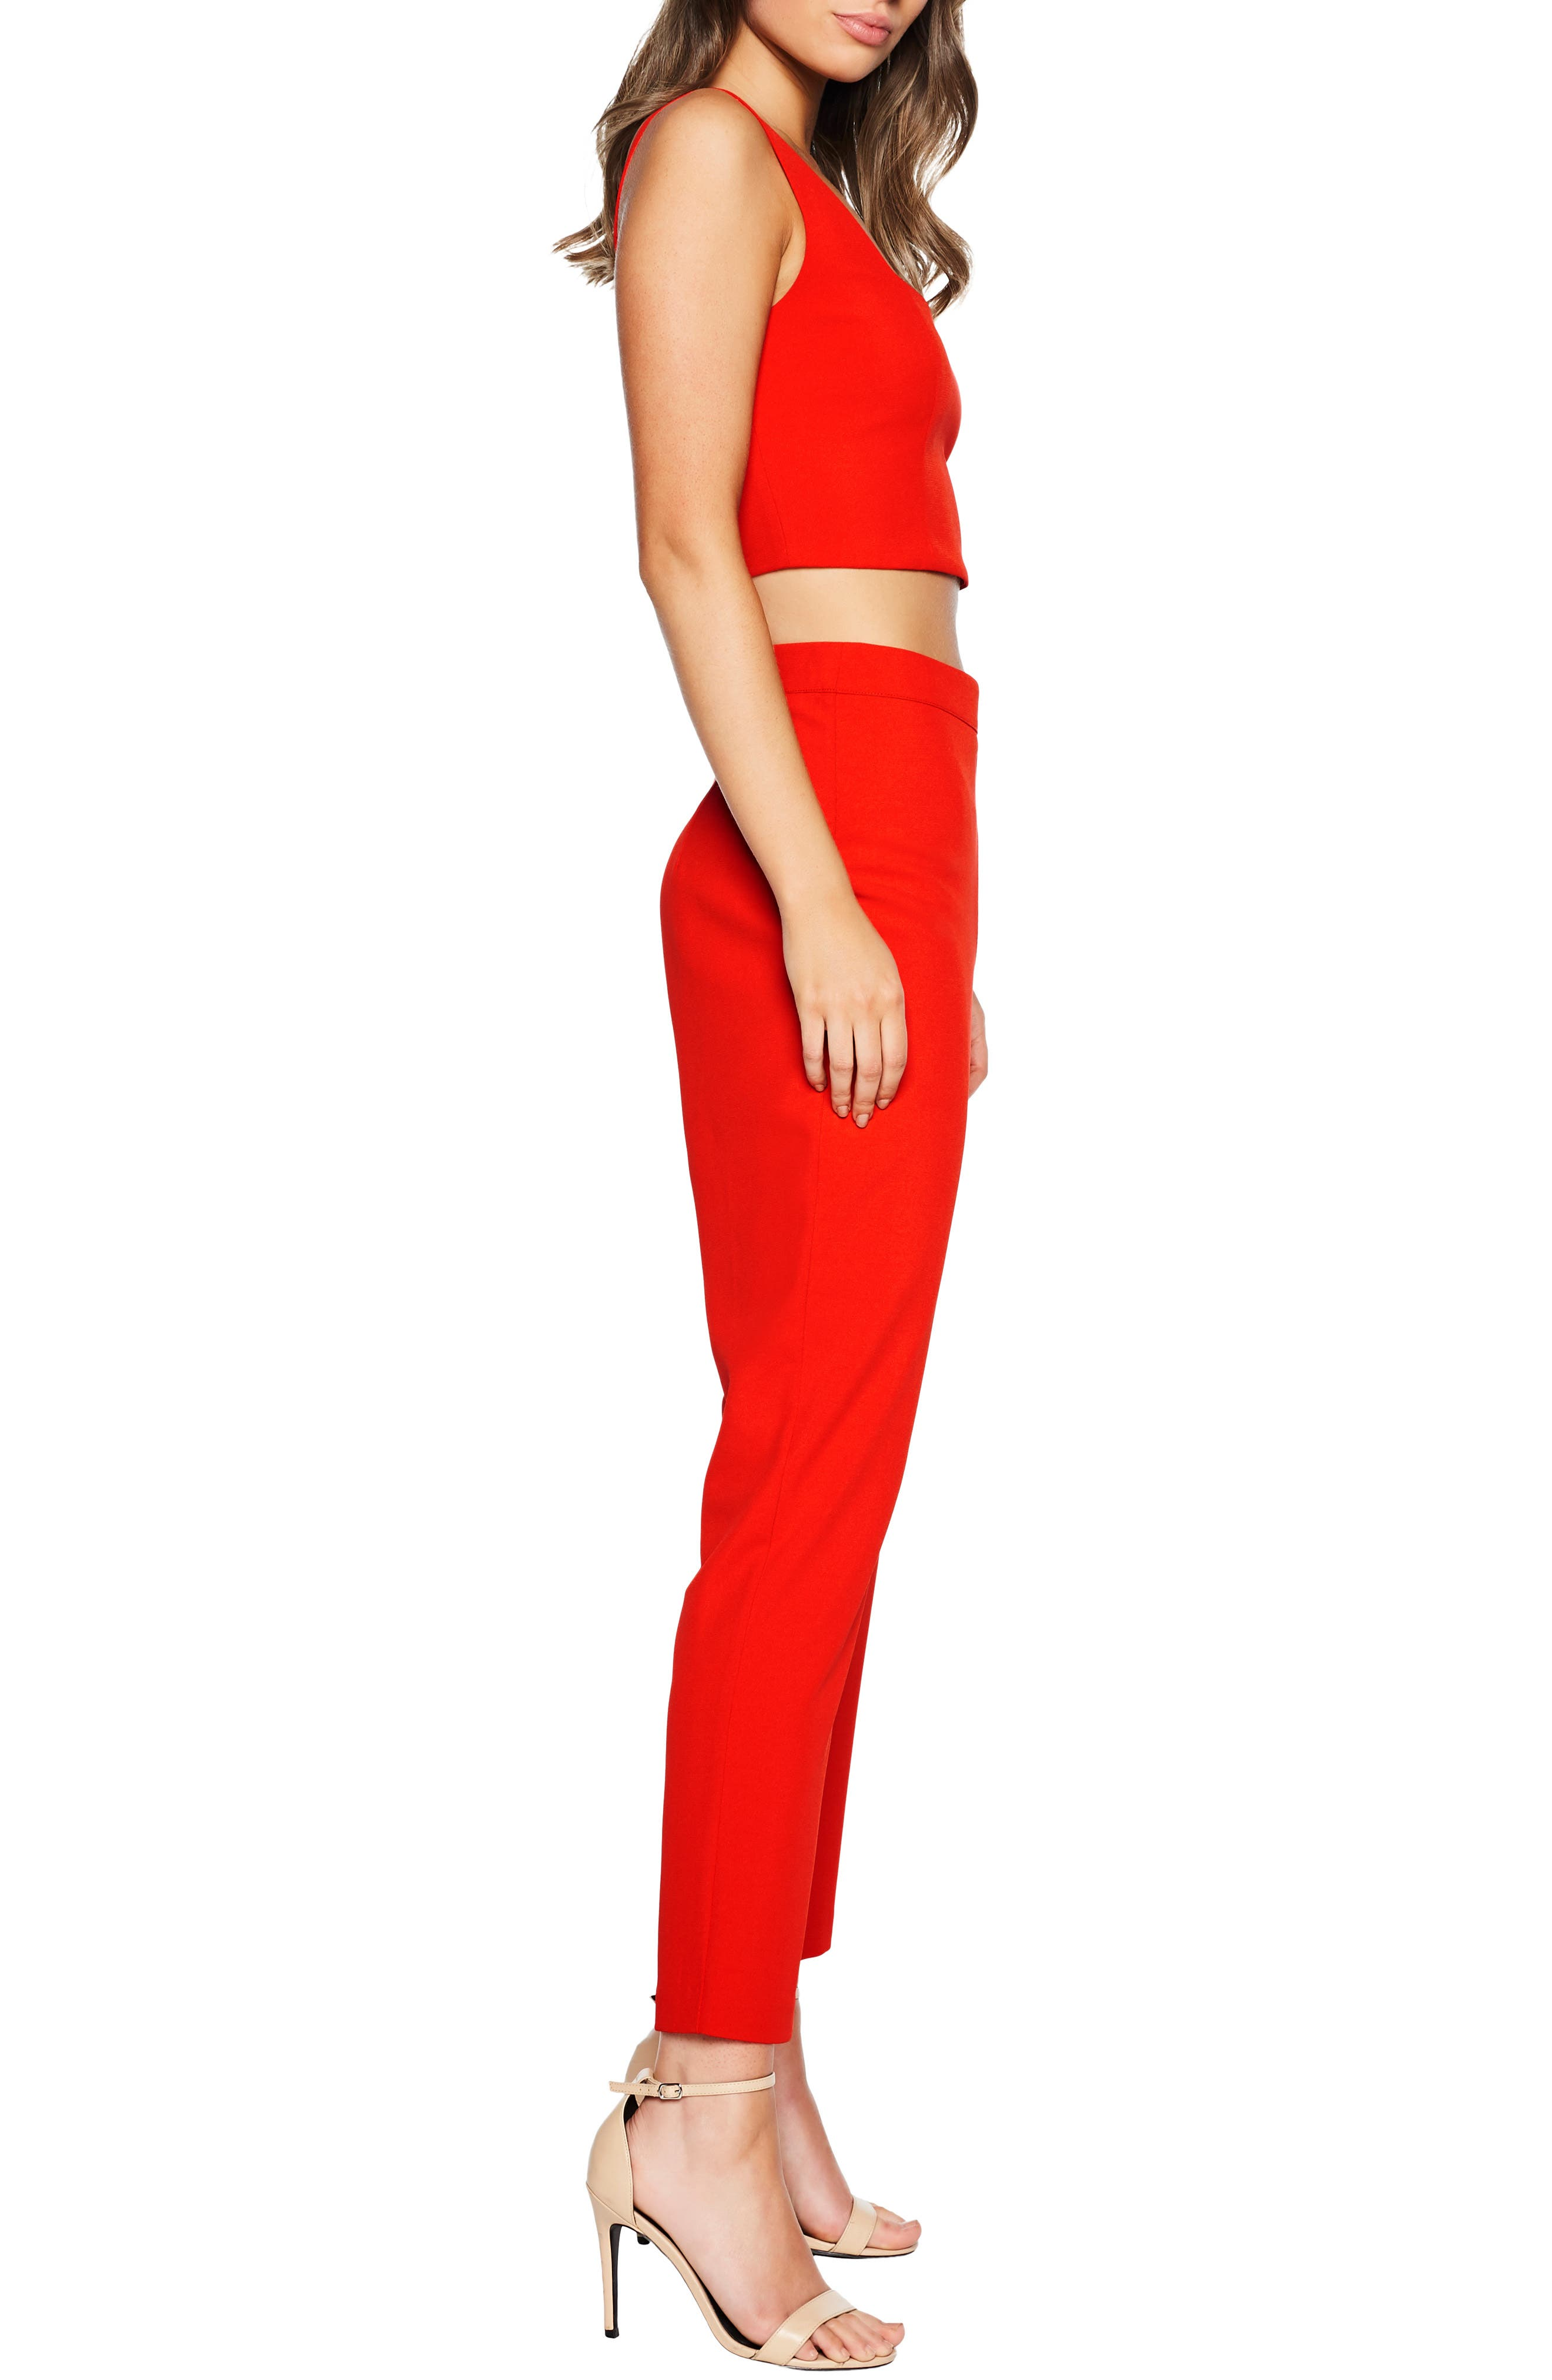 BARDOT, Chantelle Top, Alternate thumbnail 3, color, FIRE RED